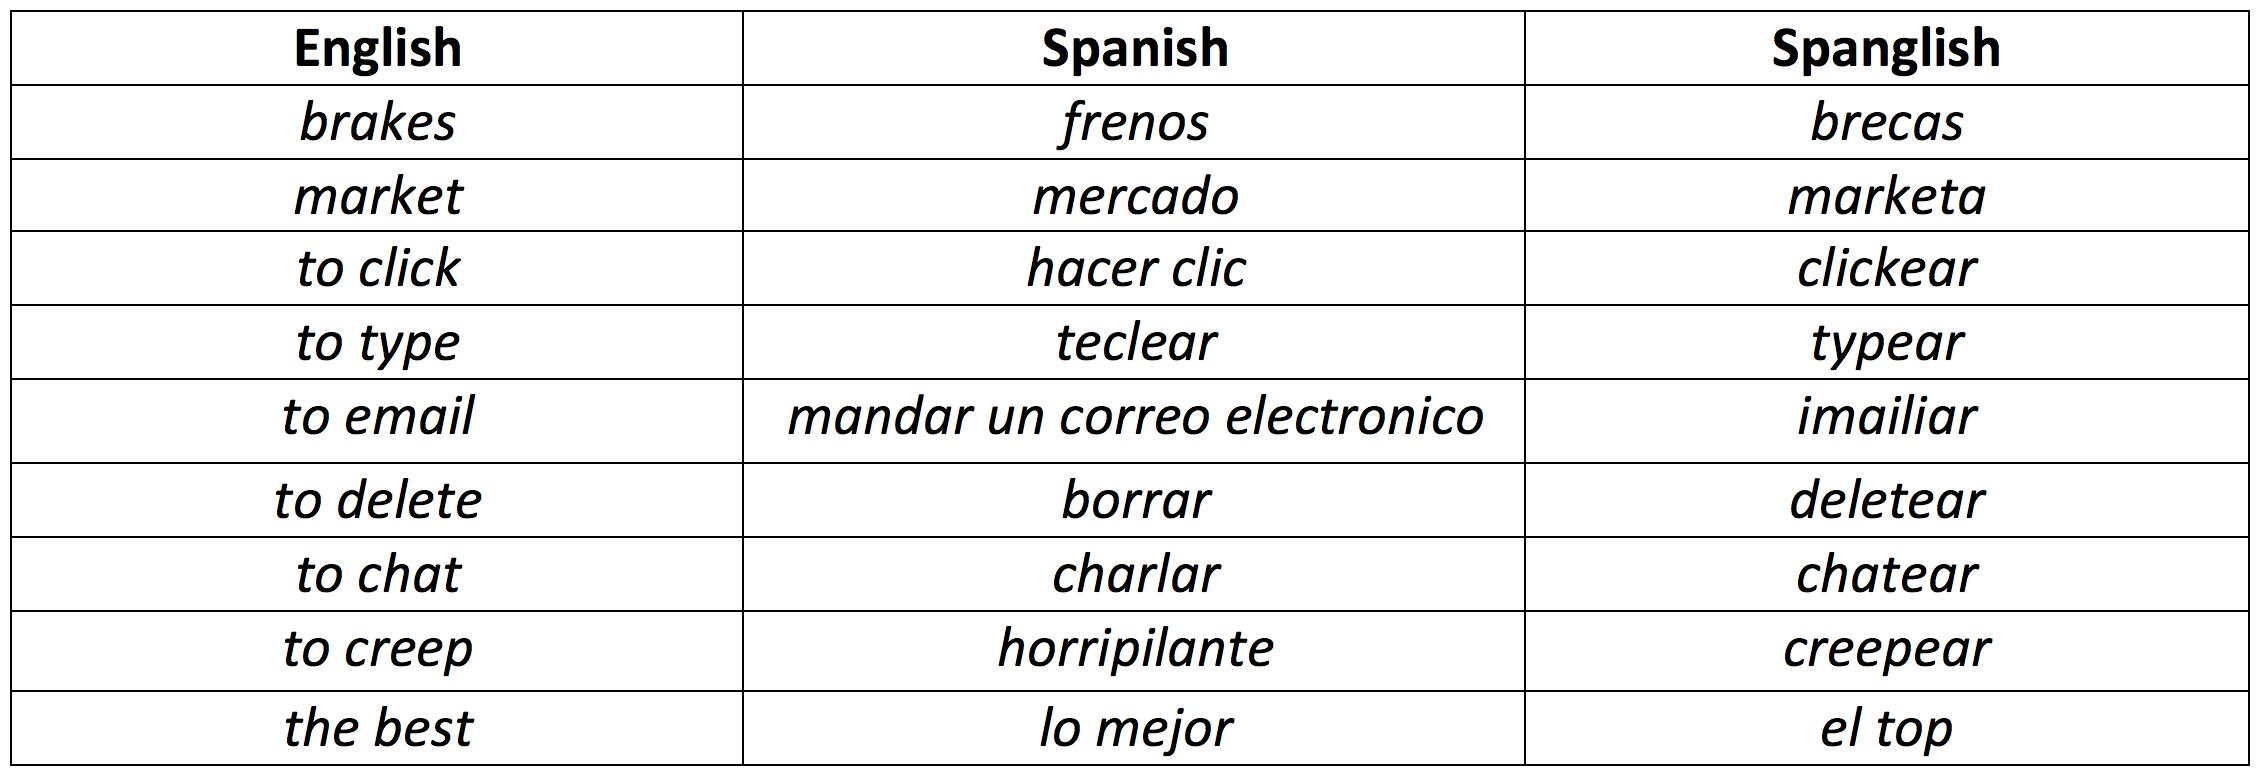 Is Spanglish Just Spanish Slang